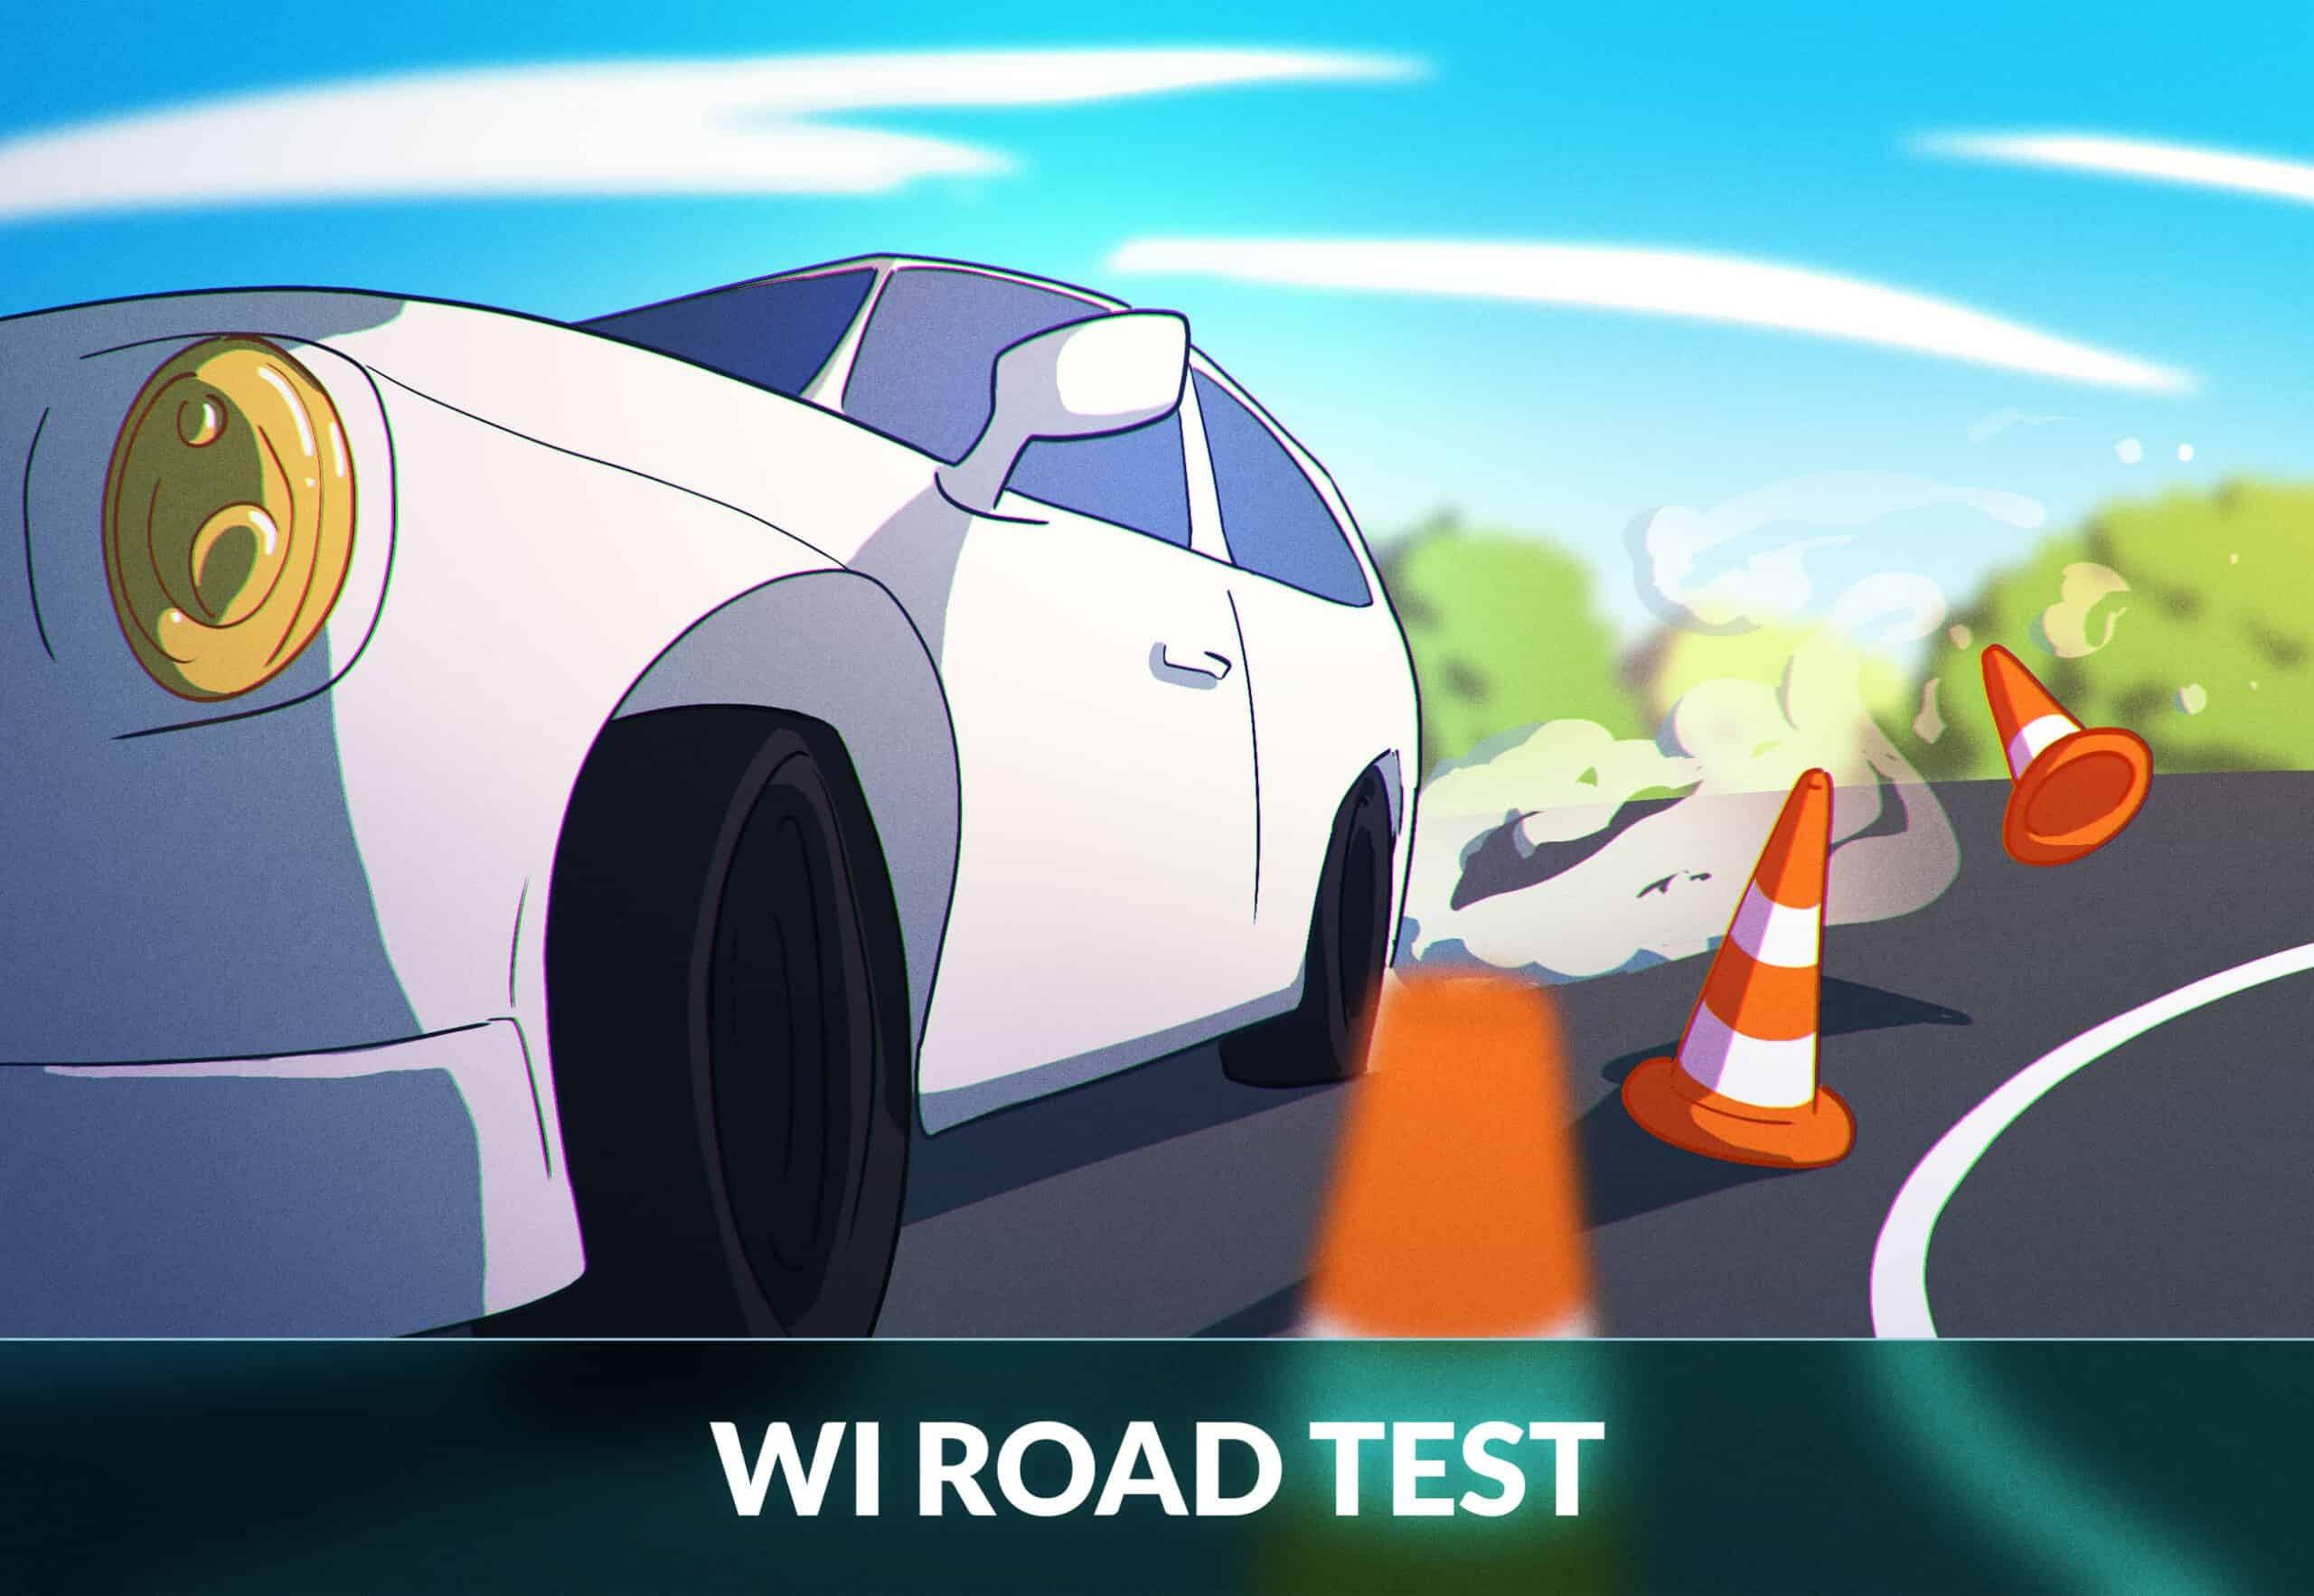 Wisconsin road test